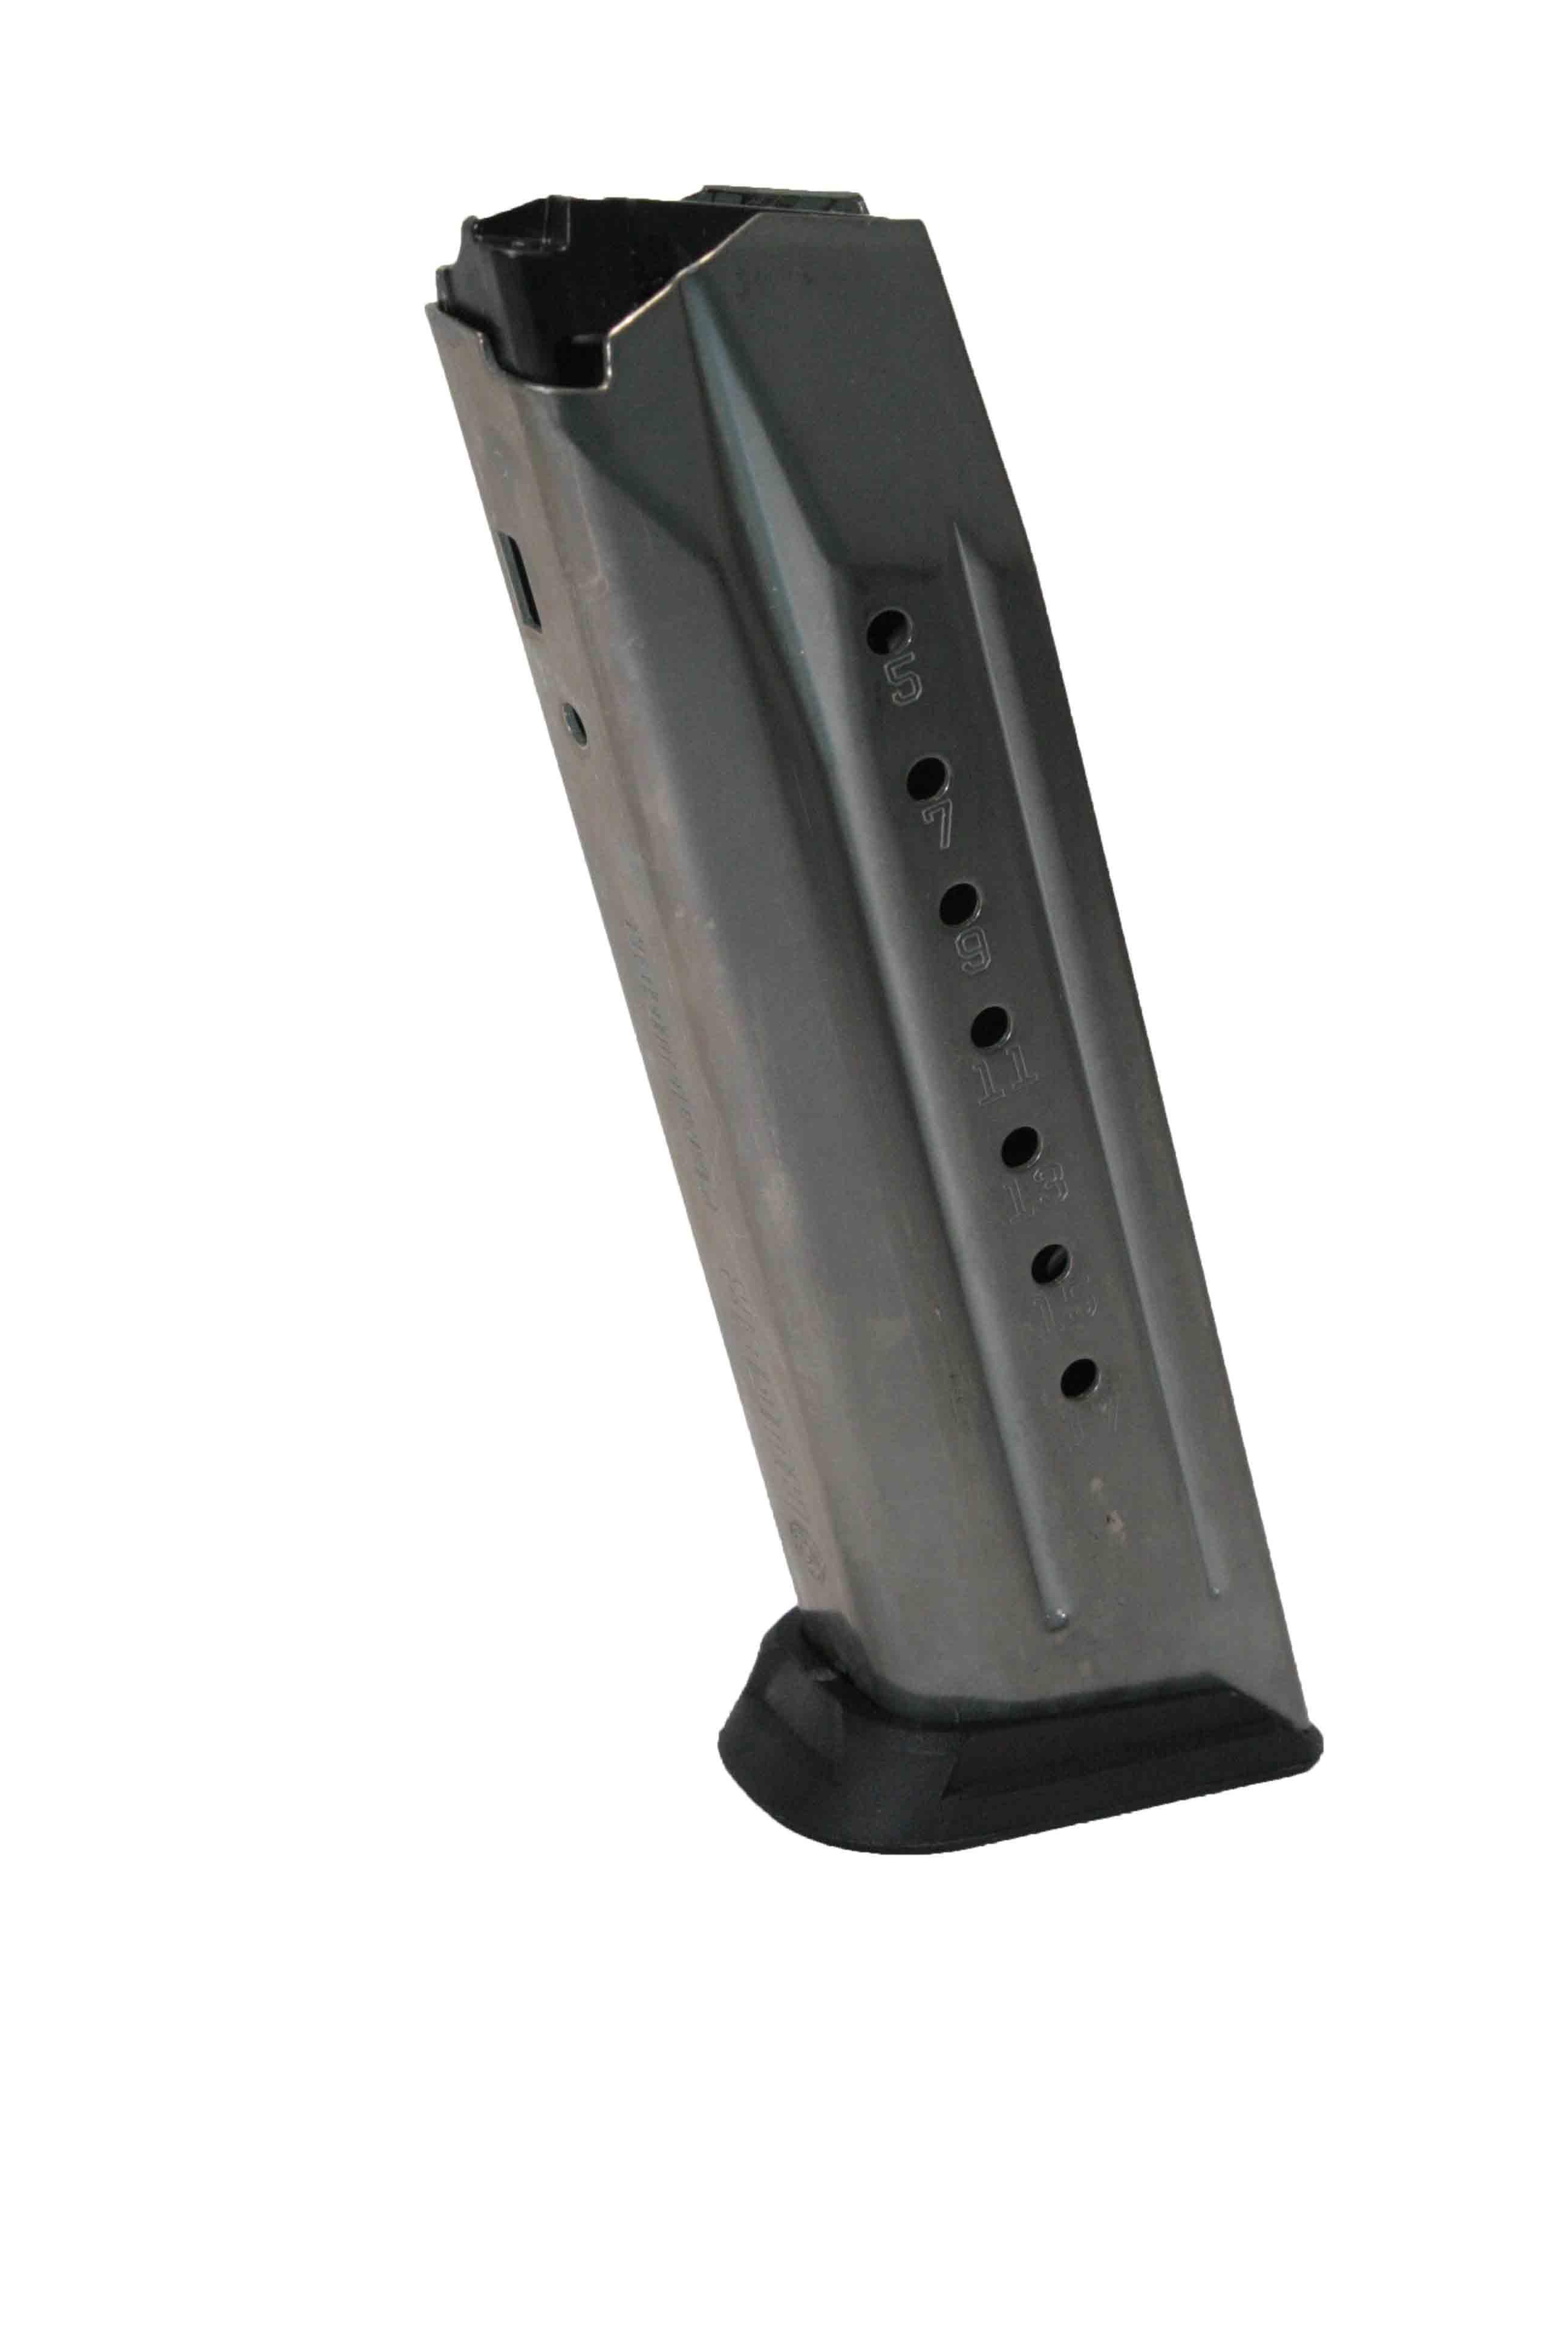 Ruger Magazine American Pistol 9mm 17 Round Mag